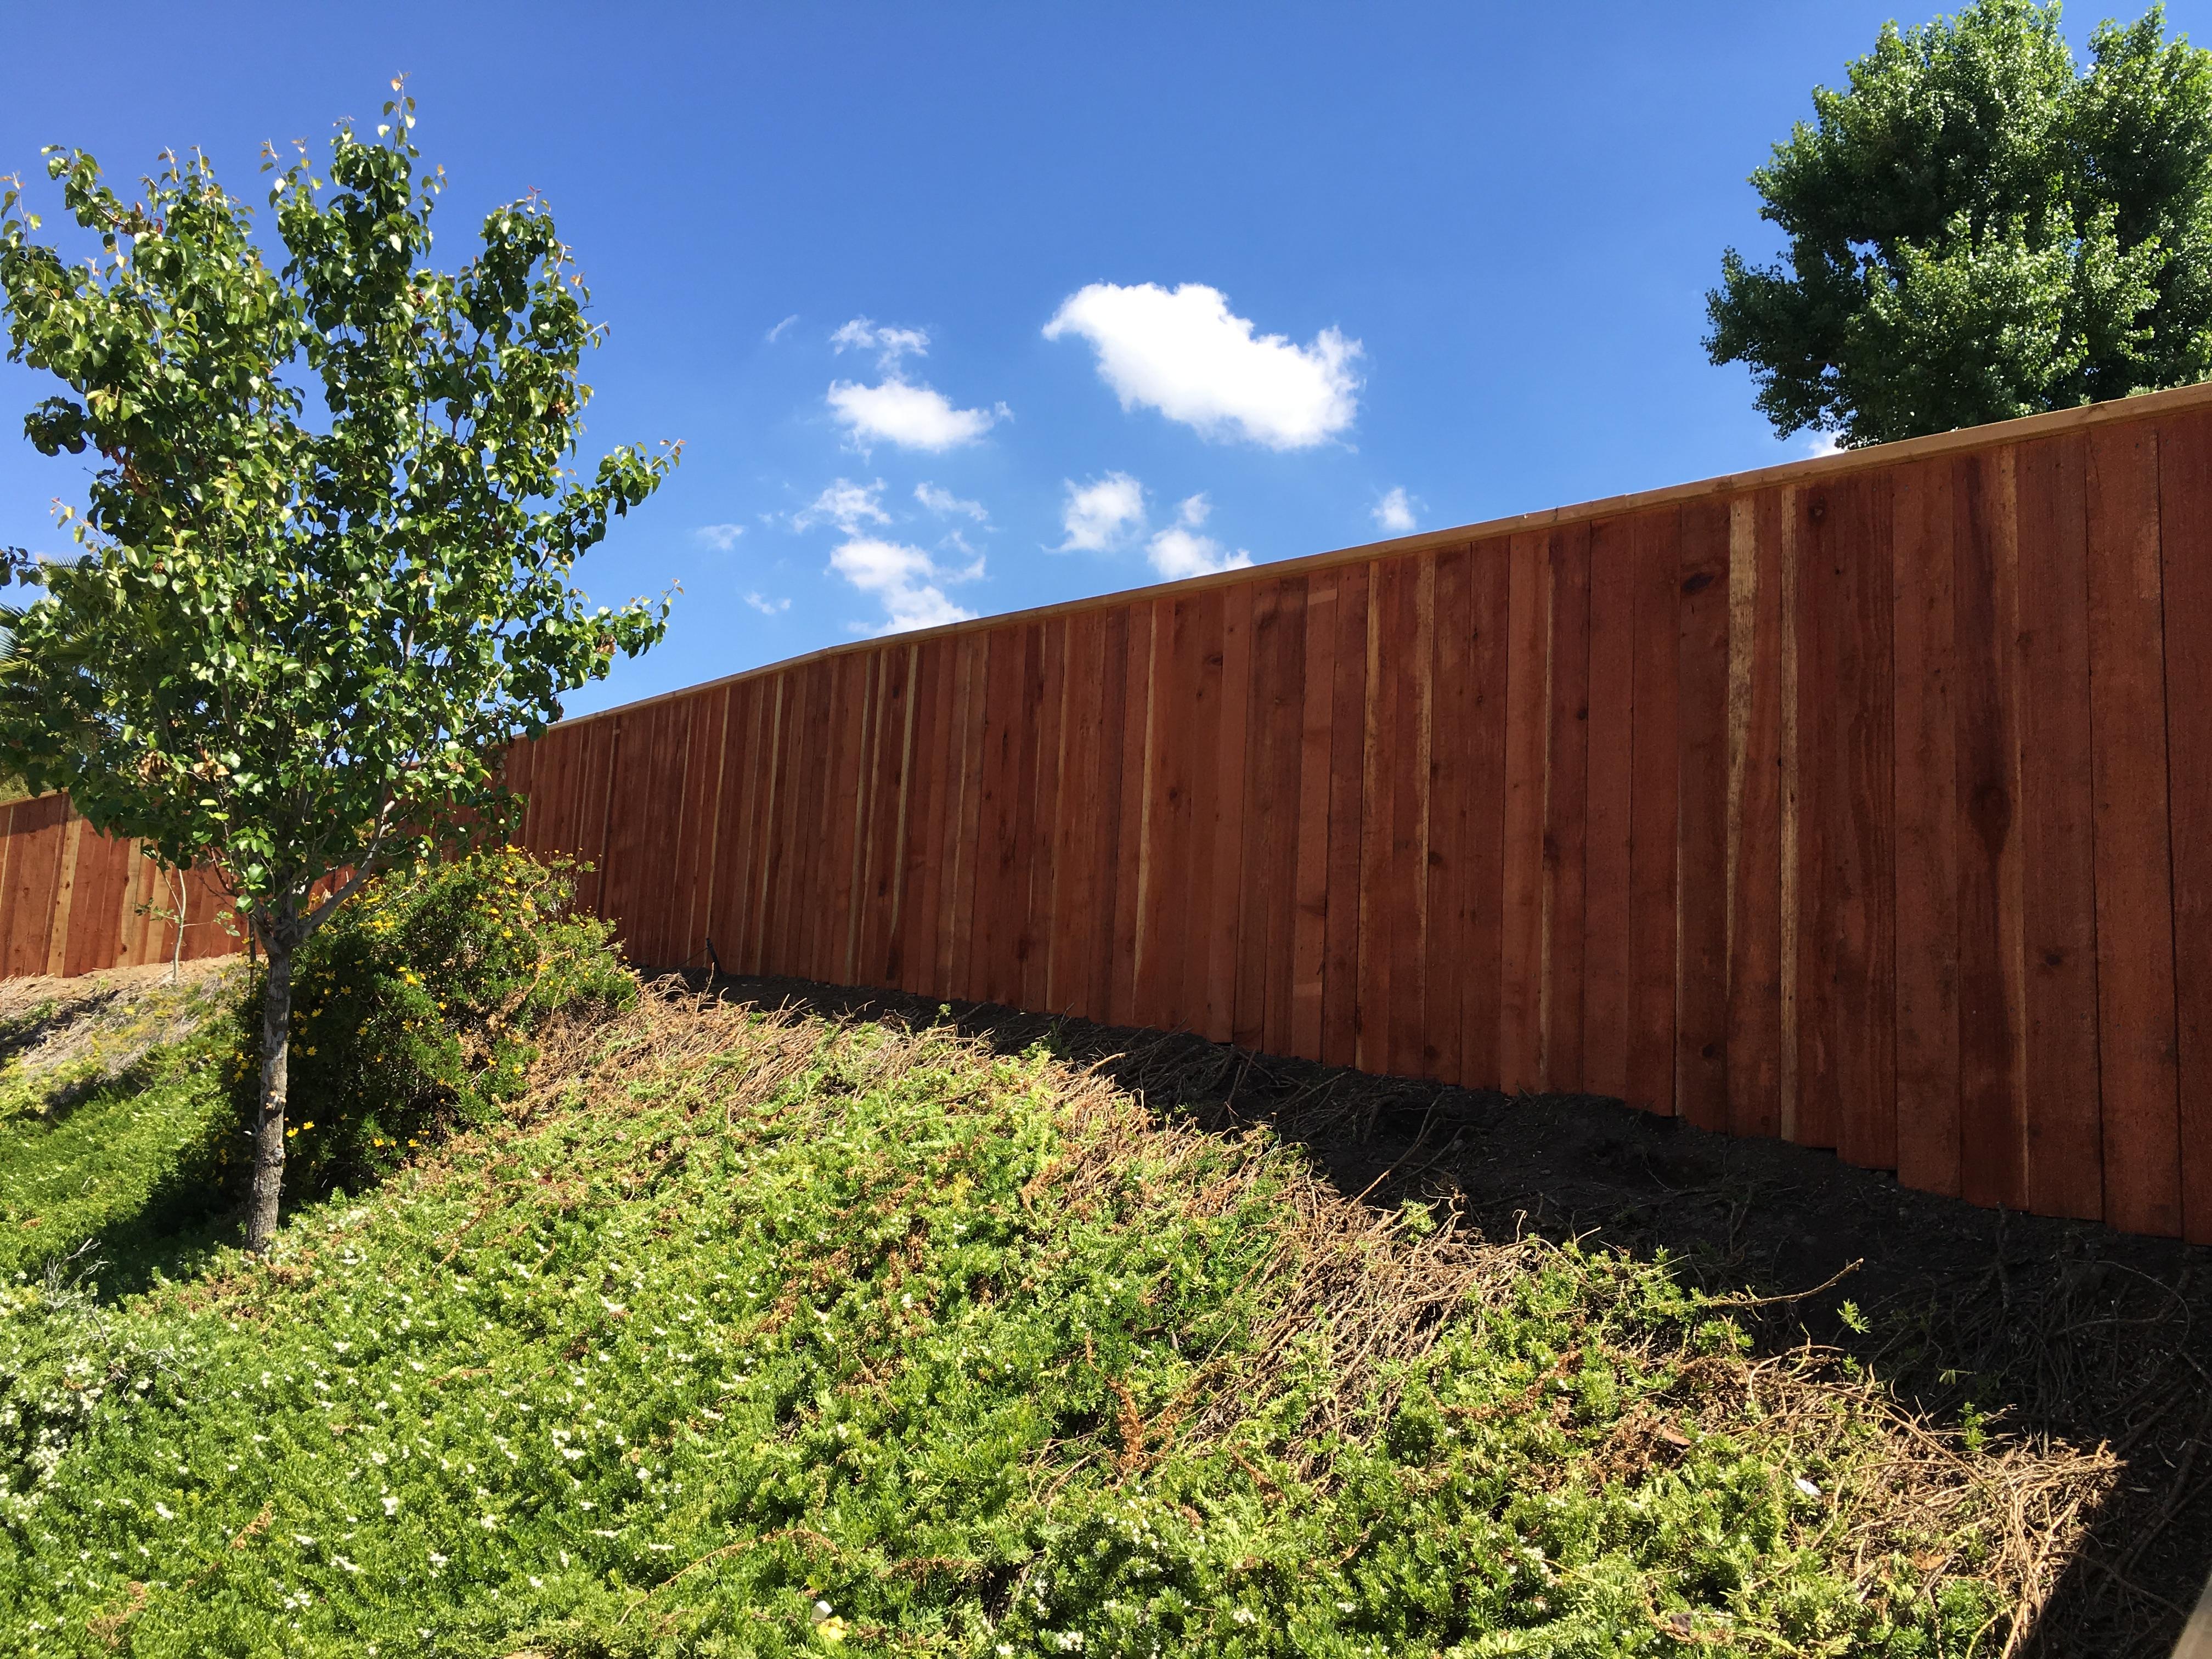 3T Fence image 27